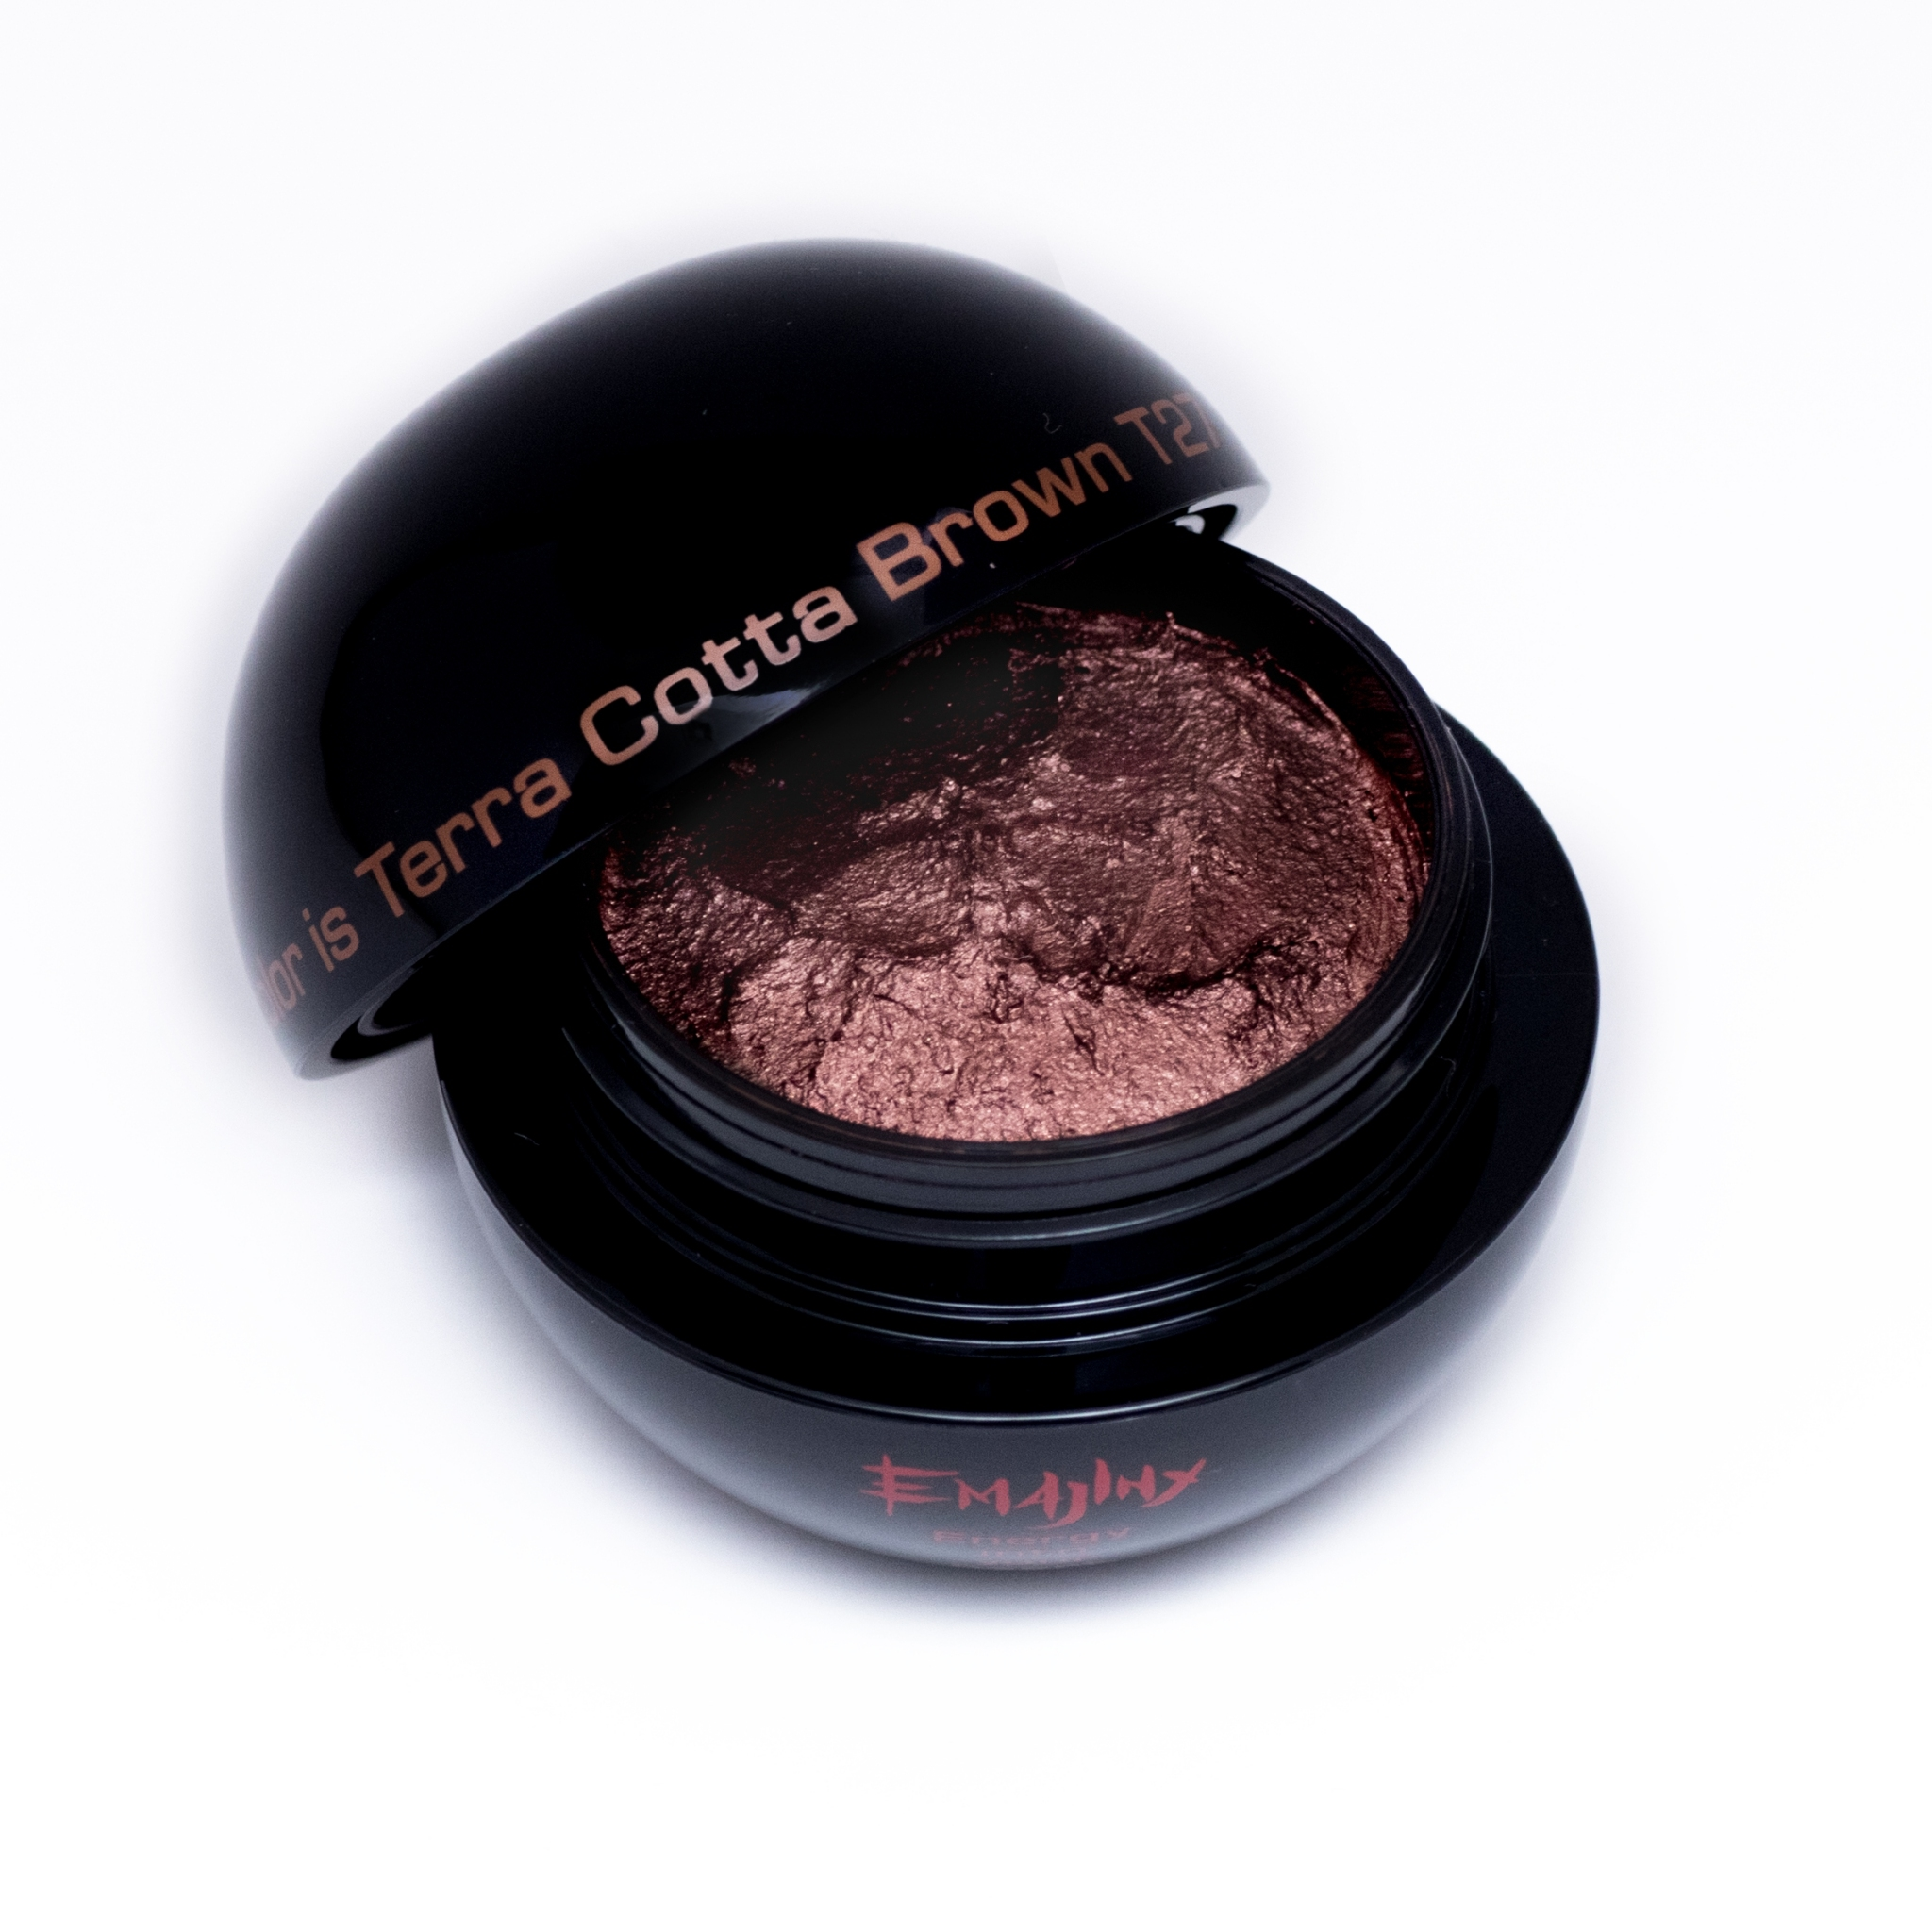 EMAJINY Terra Cotta Brown T27(ブラウンヘアカラーワックス)